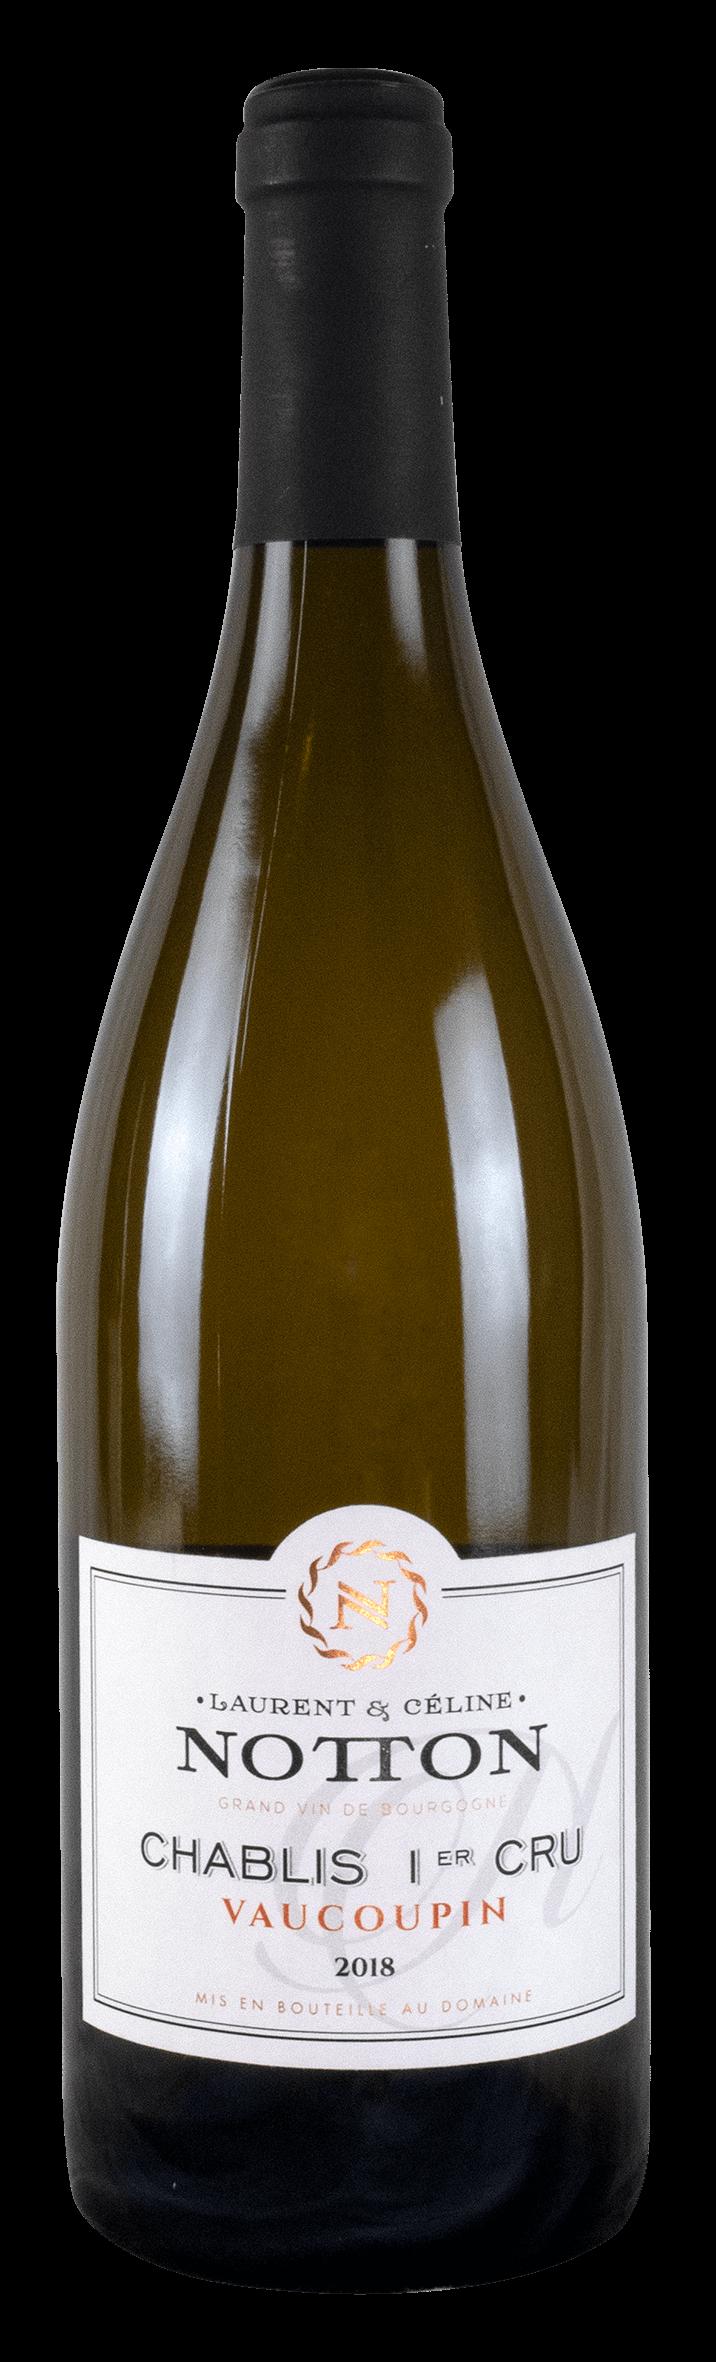 bouteille NOTTON Chablis 1er Cru VAUCOUPIN 2018